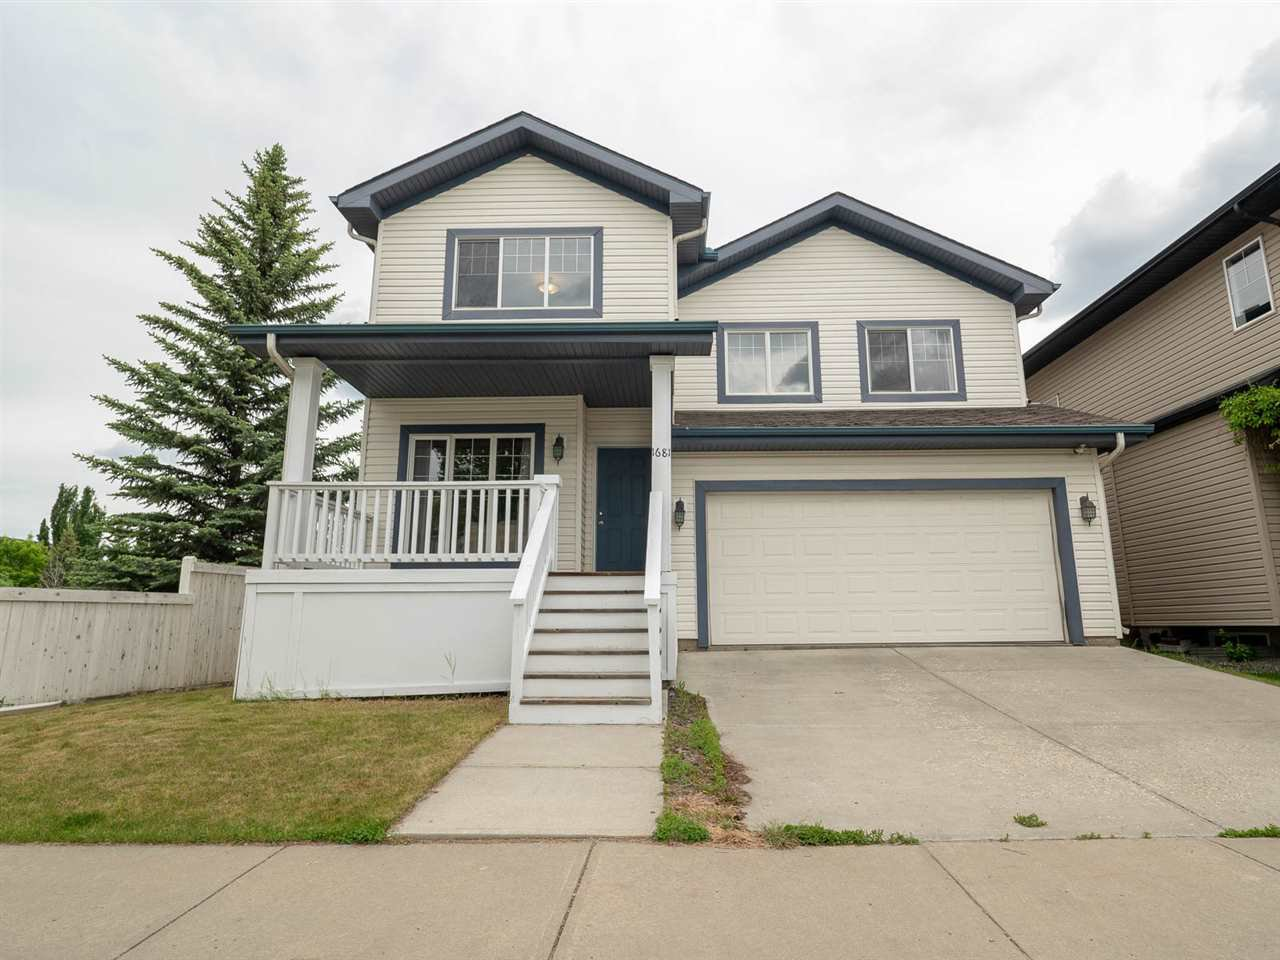 Main Photo: 1681 TOMLINSON Common in Edmonton: Zone 14 House for sale : MLS®# E4161987